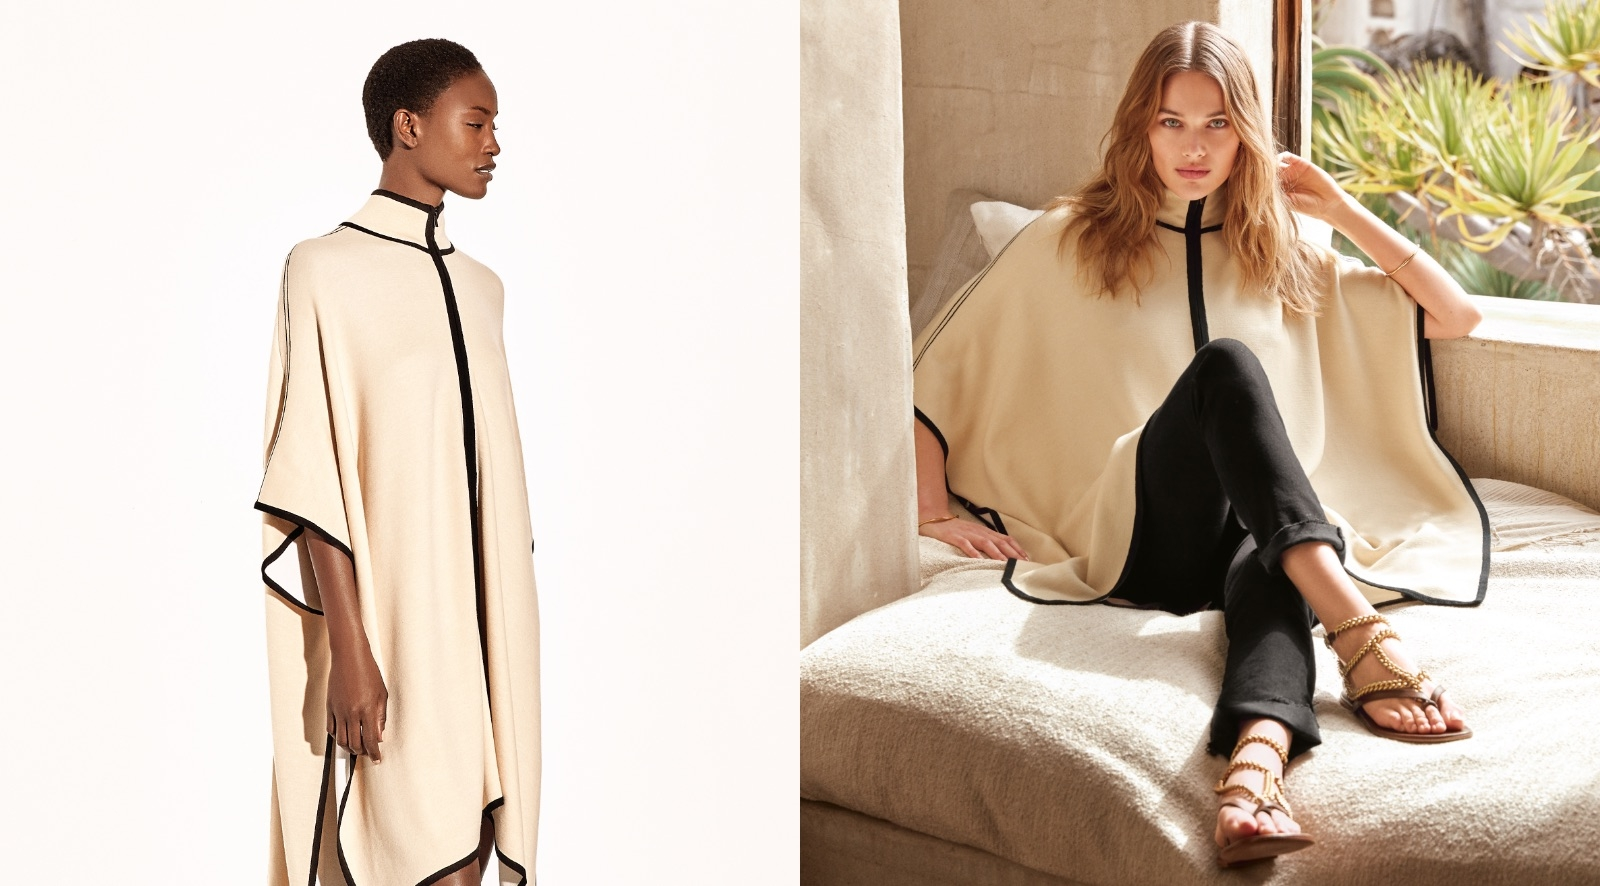 Kleding Fashion.Shop Fashion And Clothing For Women St John Knits